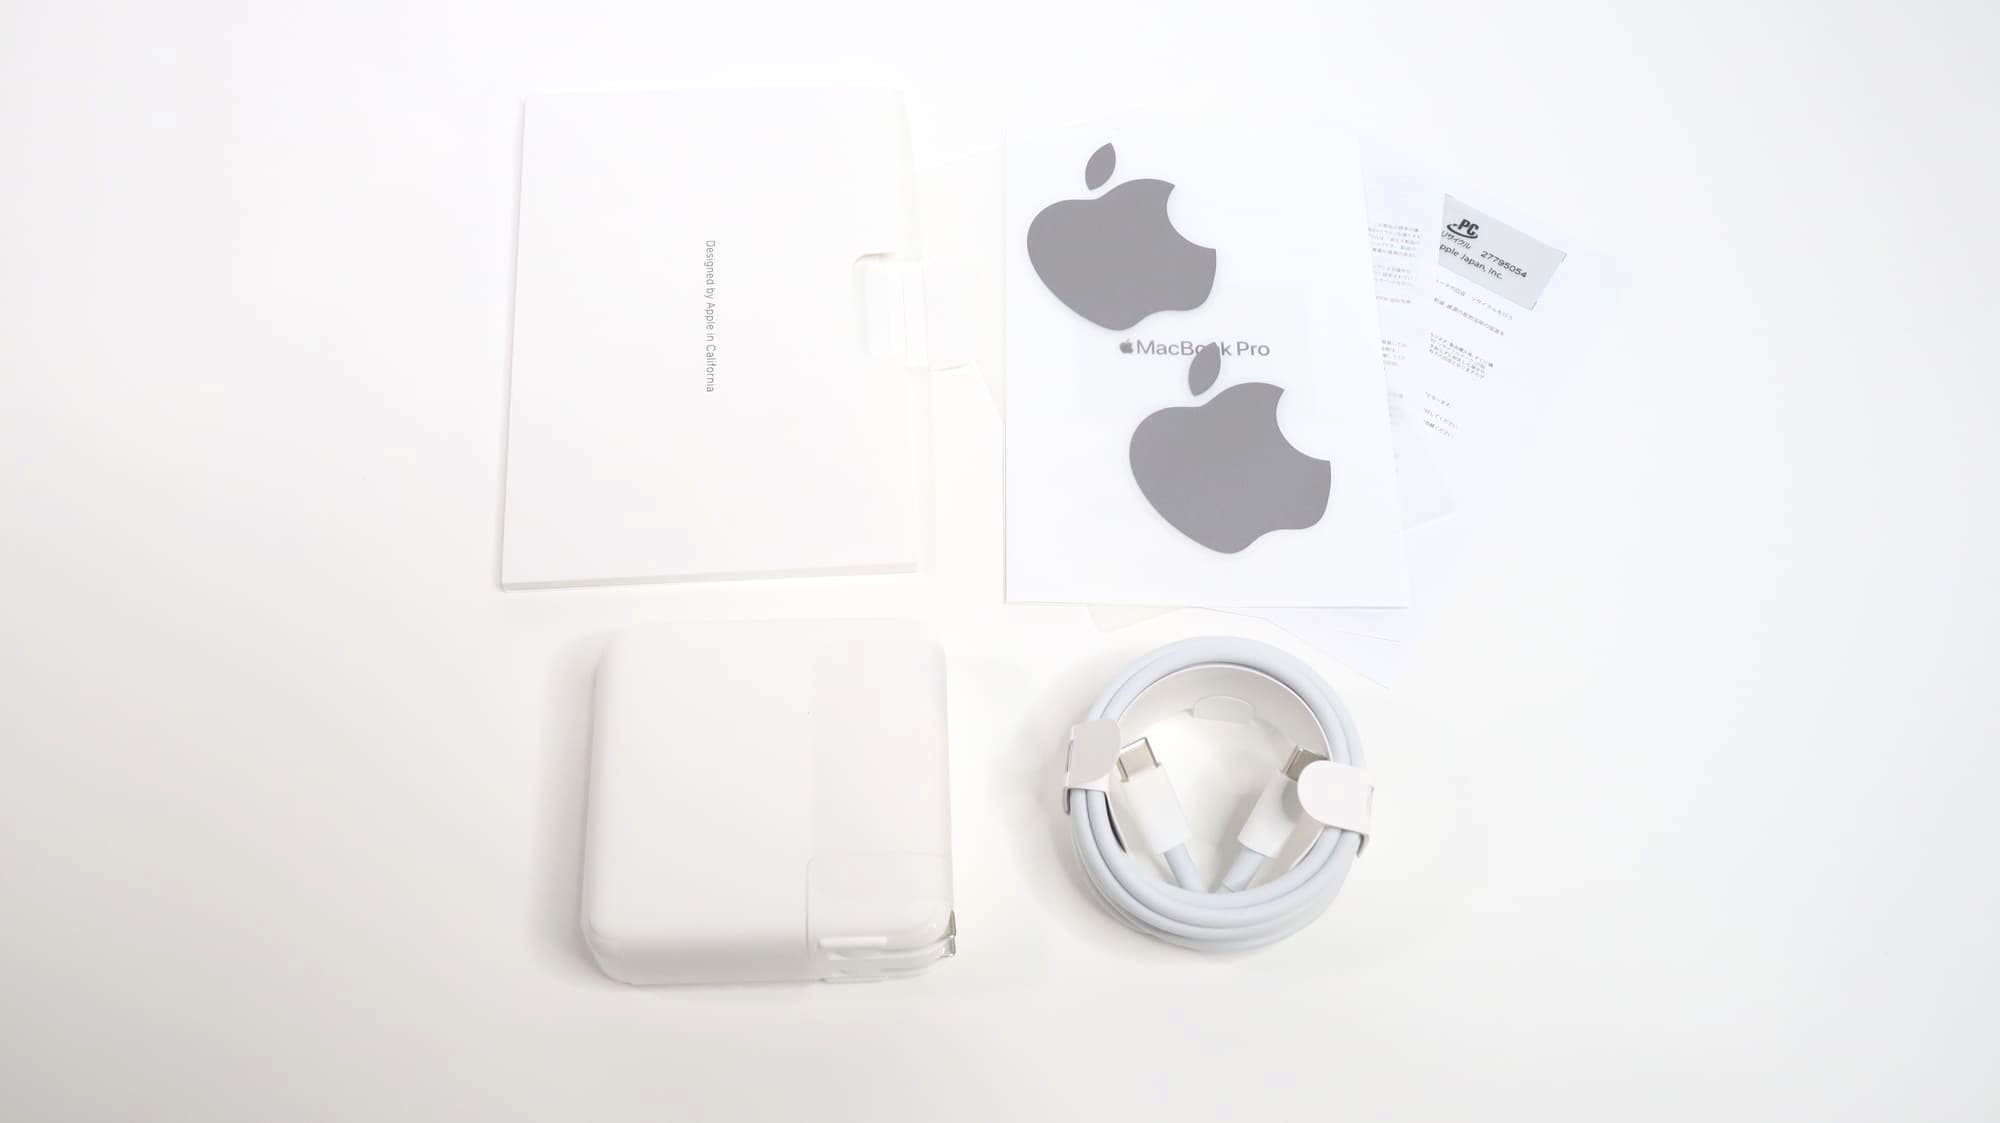 MacBook Pro 2020の付属品